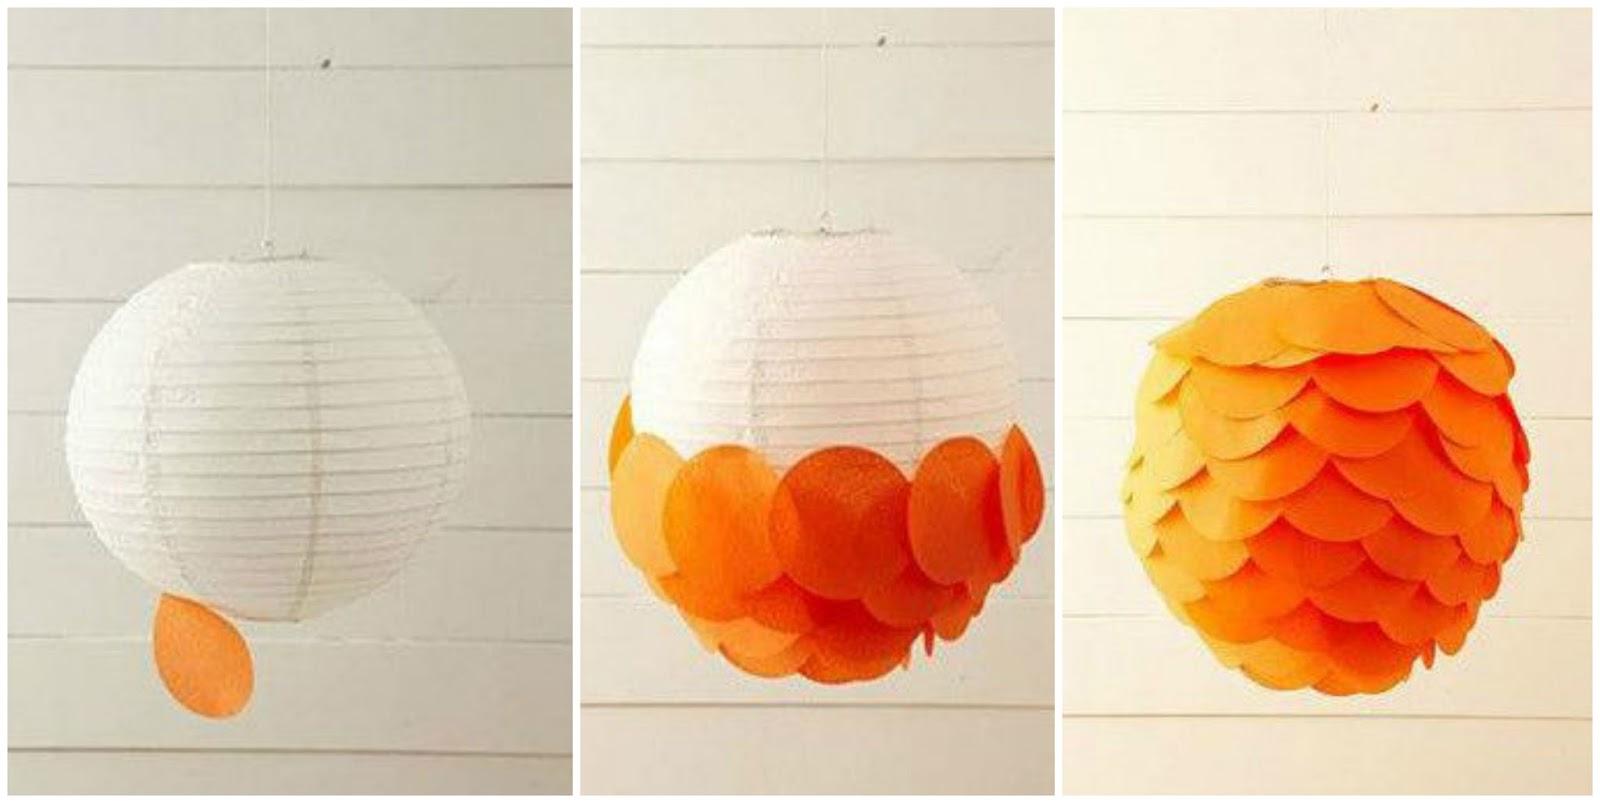 Adornos de papel colgantes para fiestas cositasconmesh - Como hacer cadenetas de papel para fiestas ...